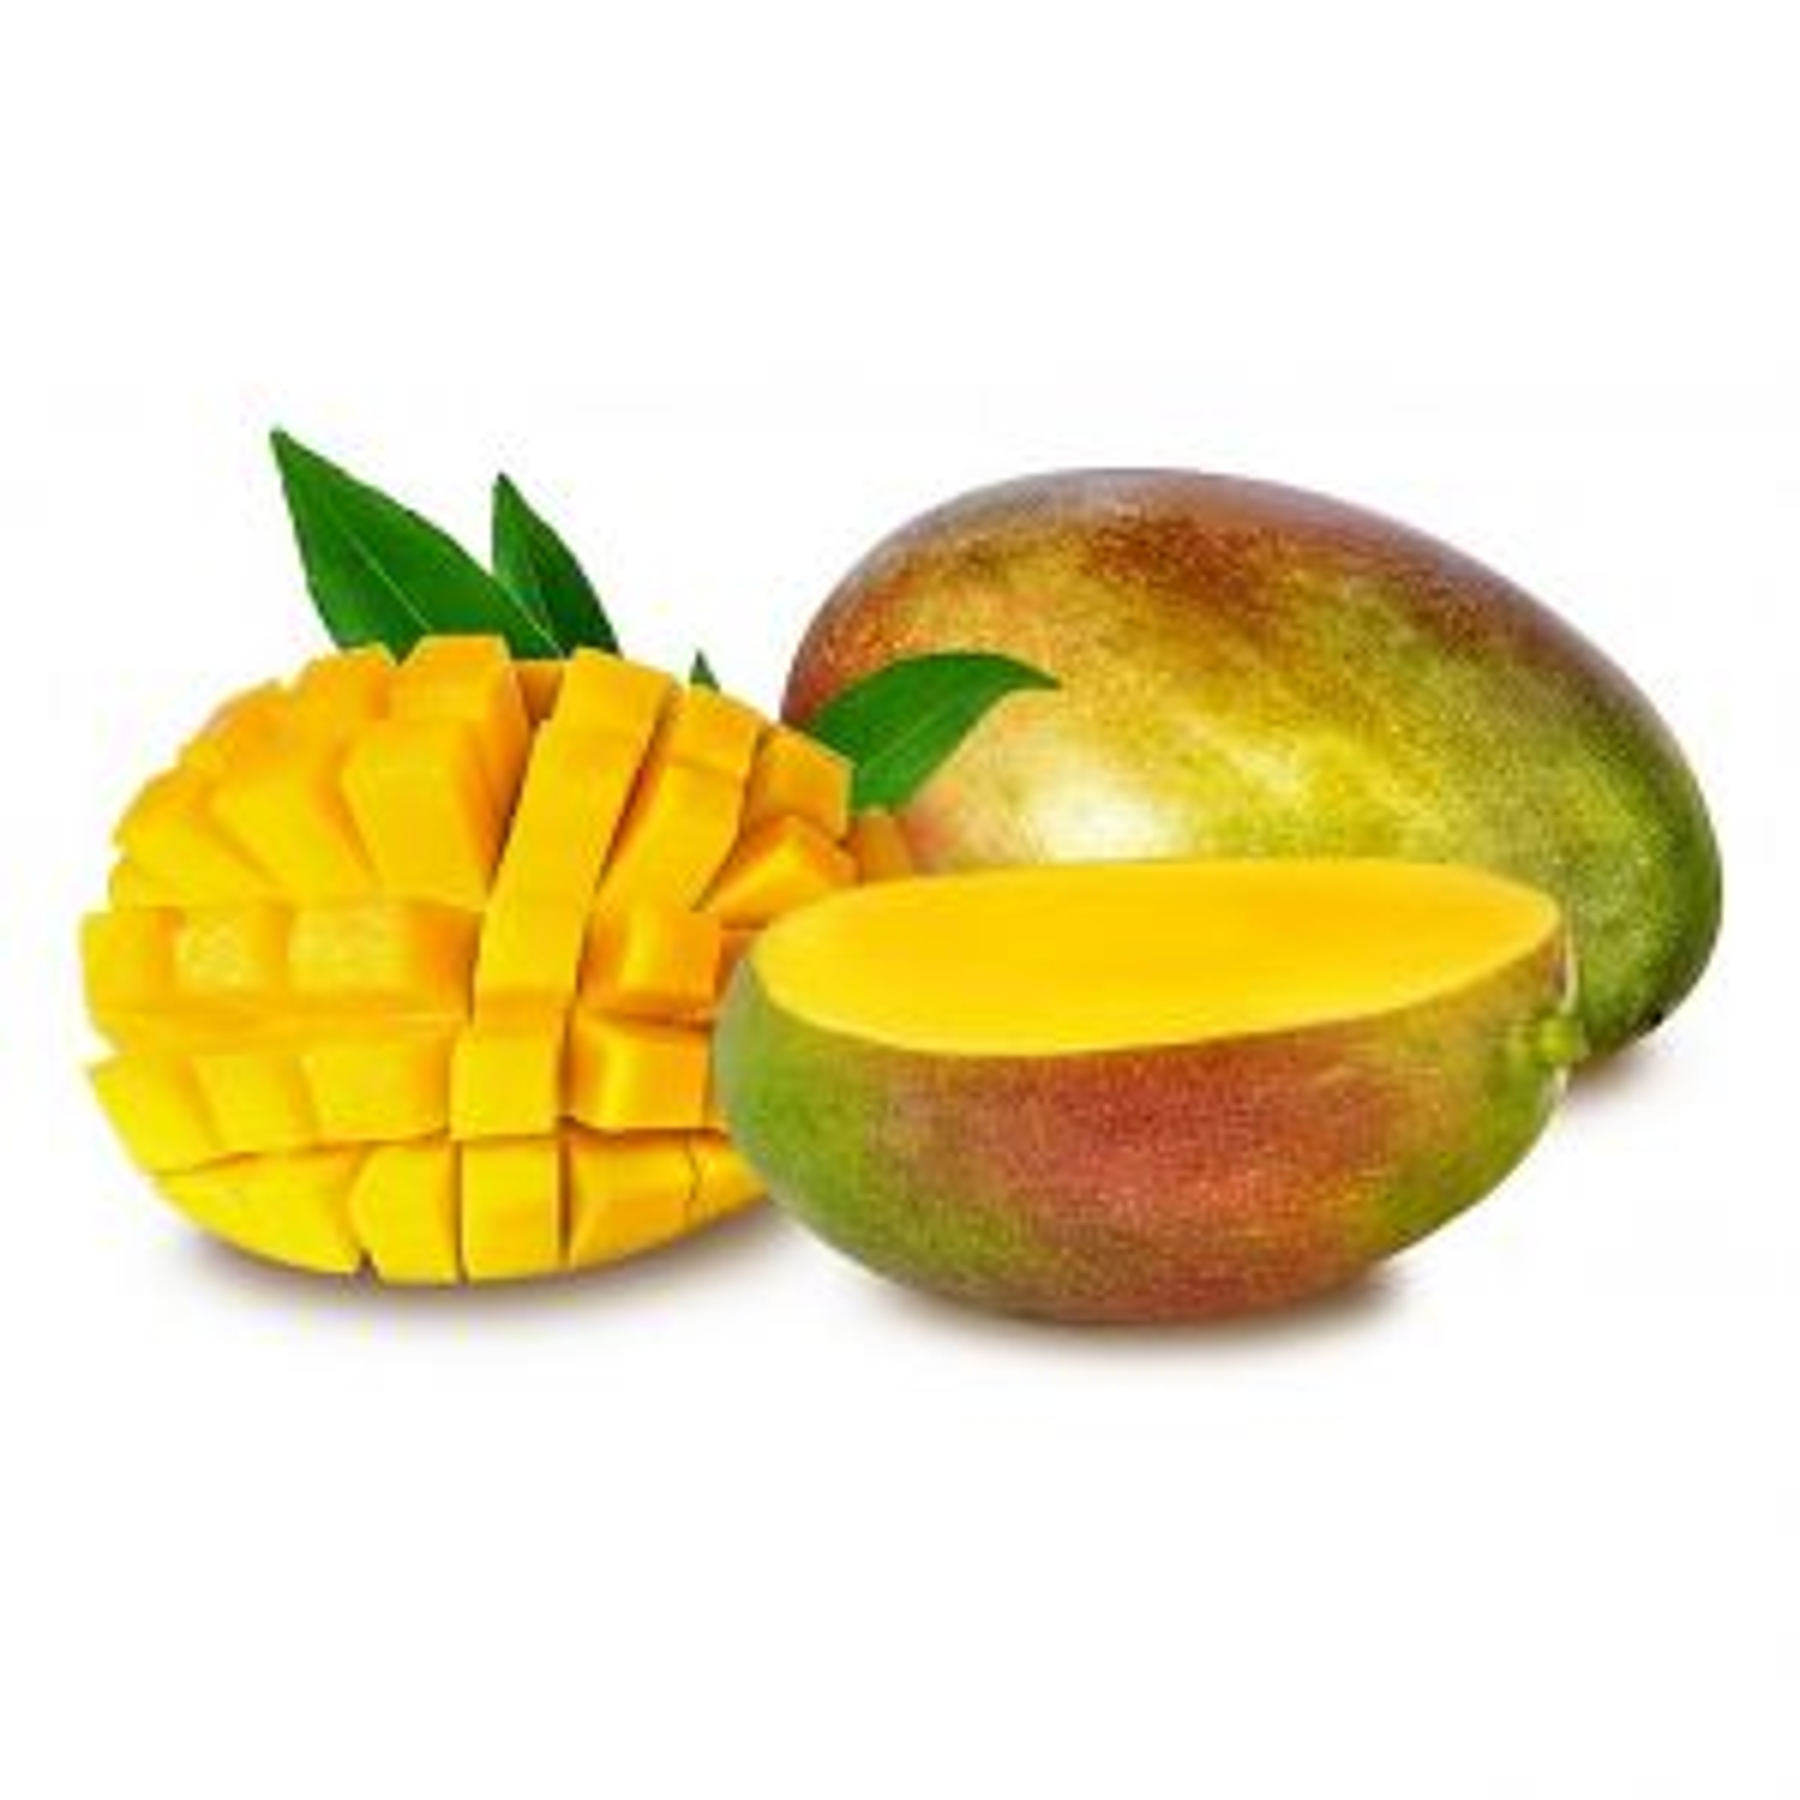 Skoddejuice Mango Aroma